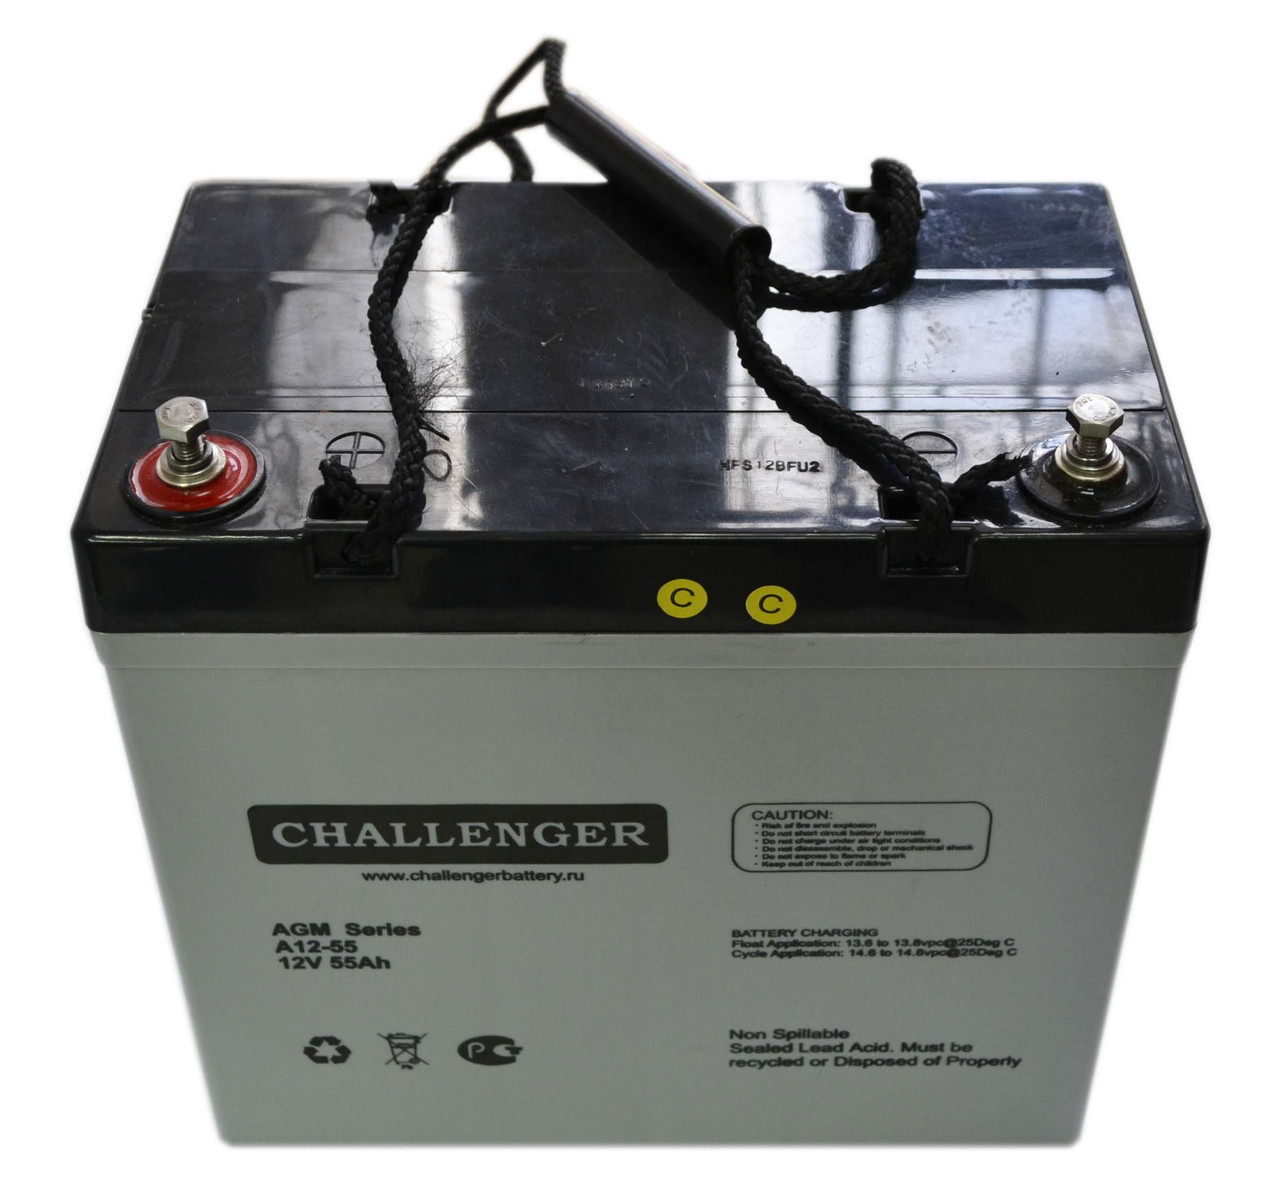 Аккумулятор мультигелевый Challenger A12-55 12V 55AH, (AGM) для ИБП